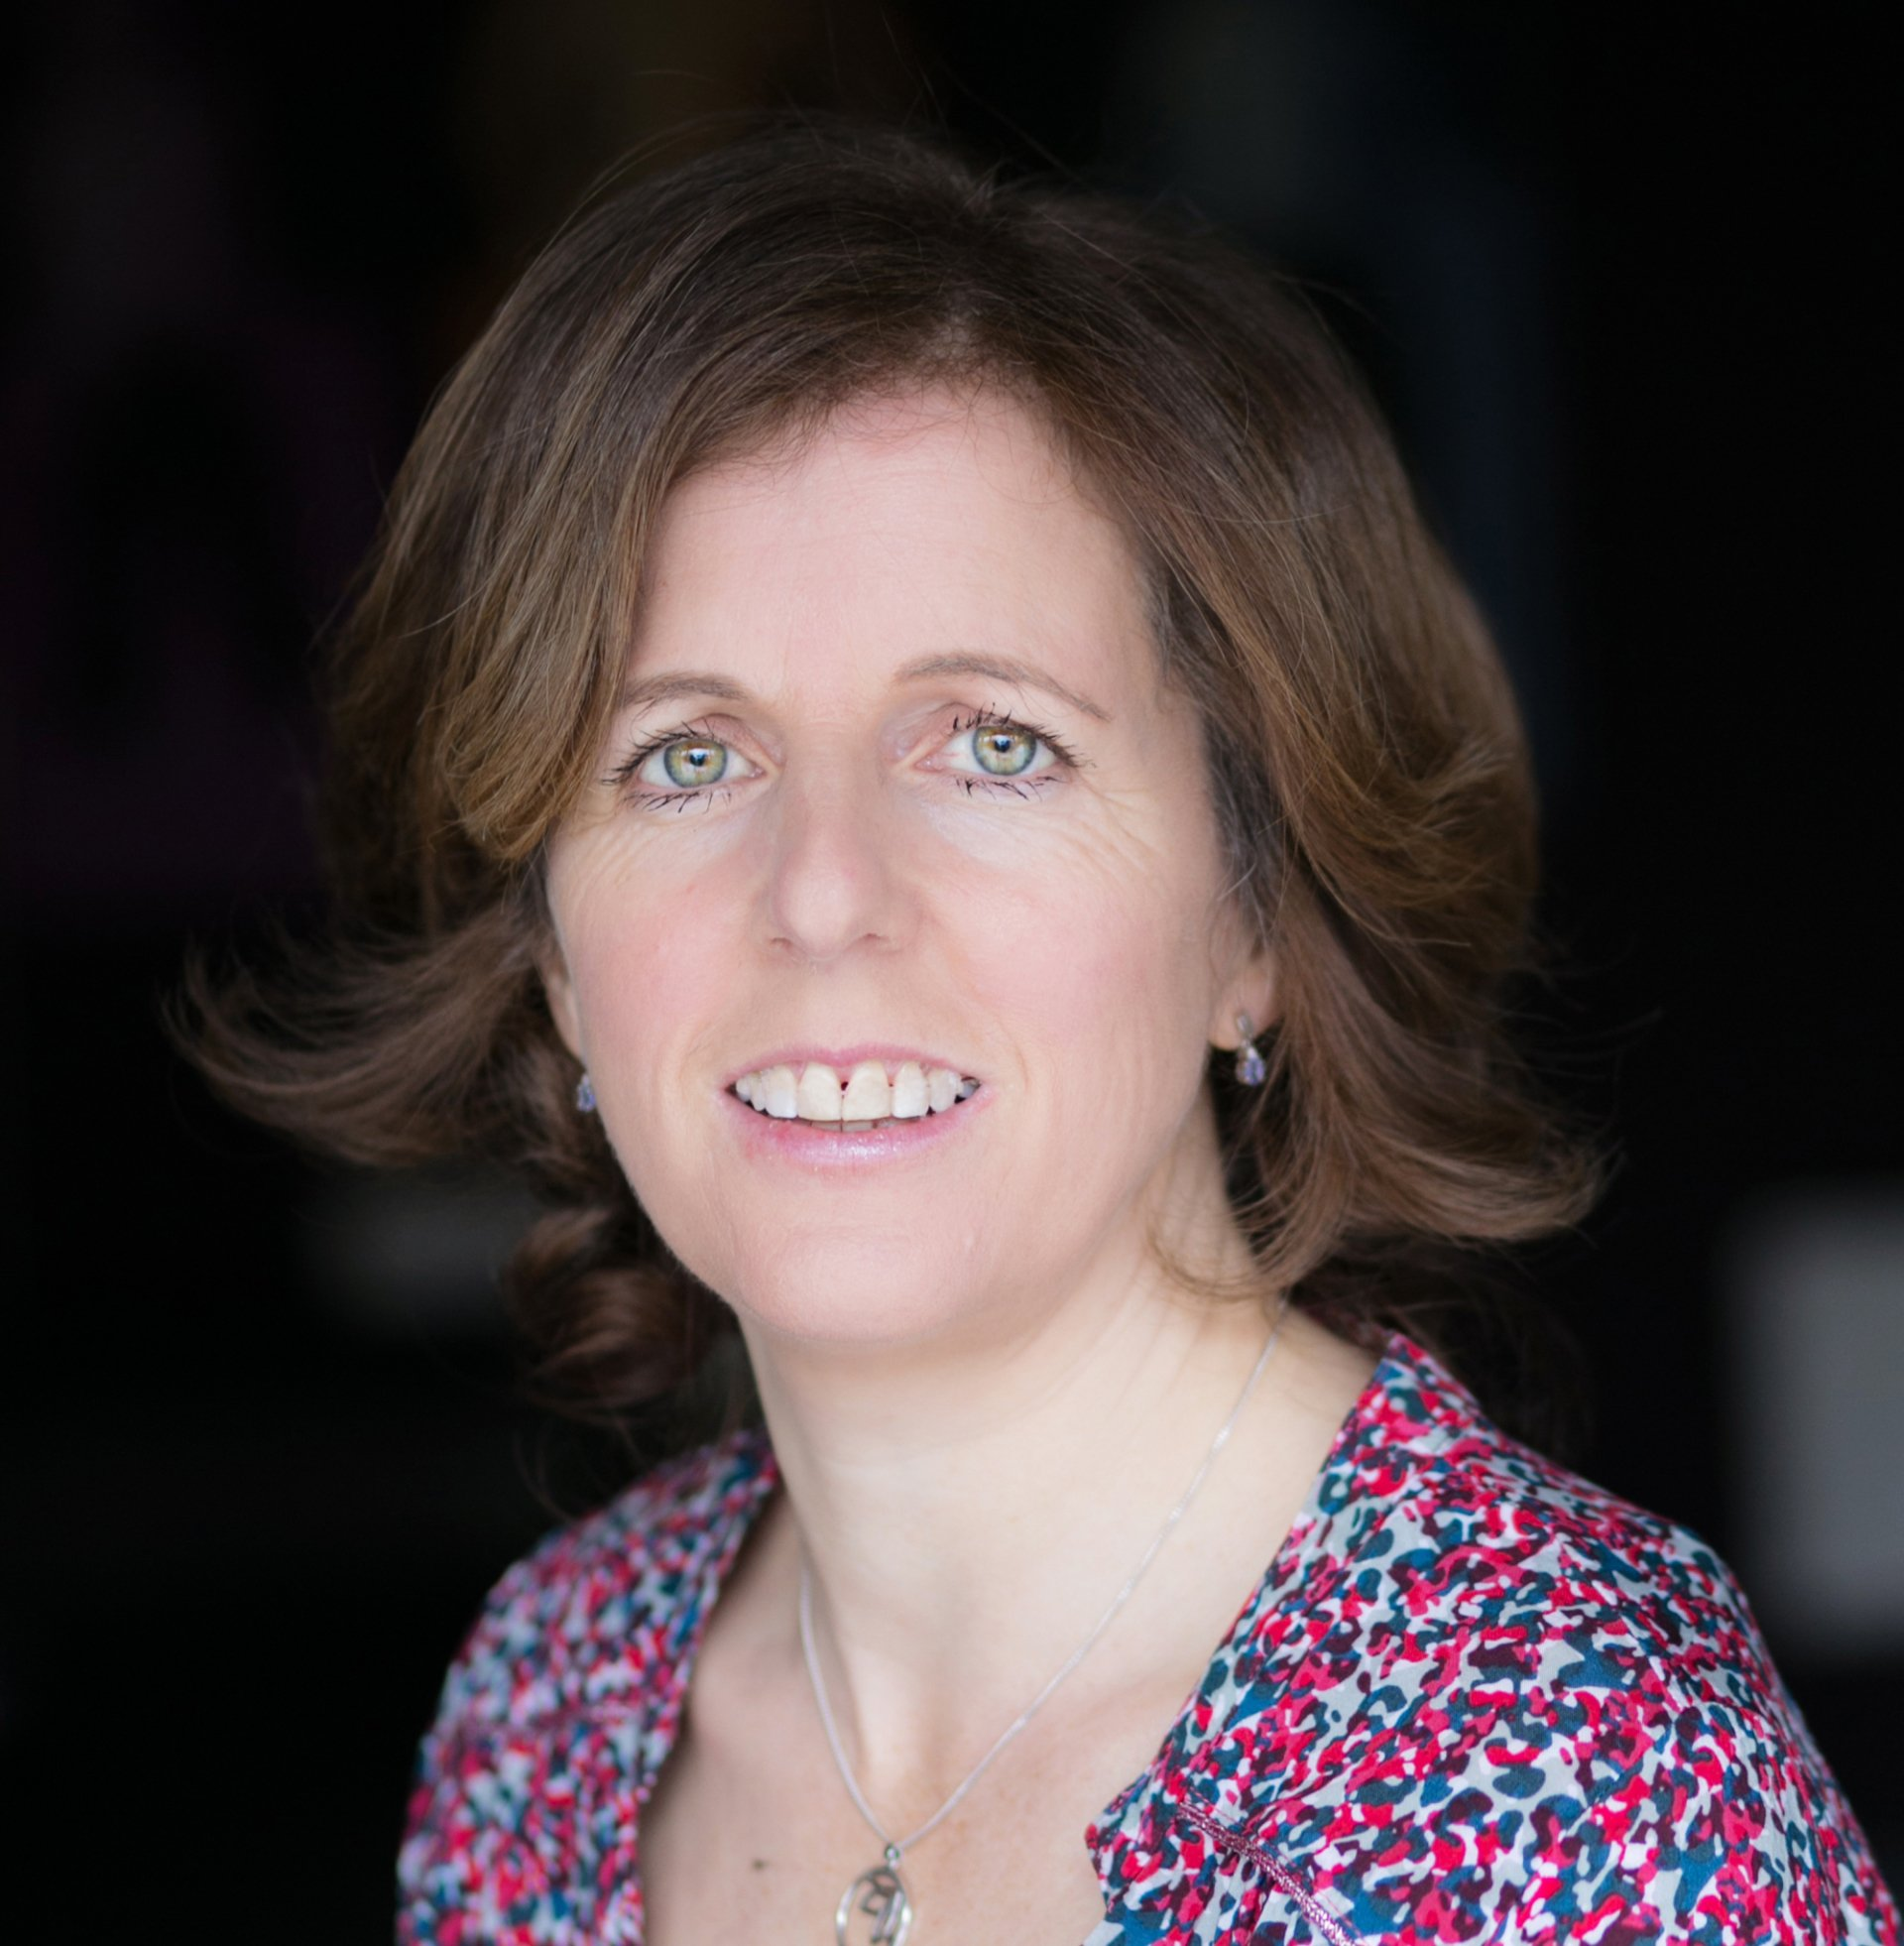 Sarah Povey